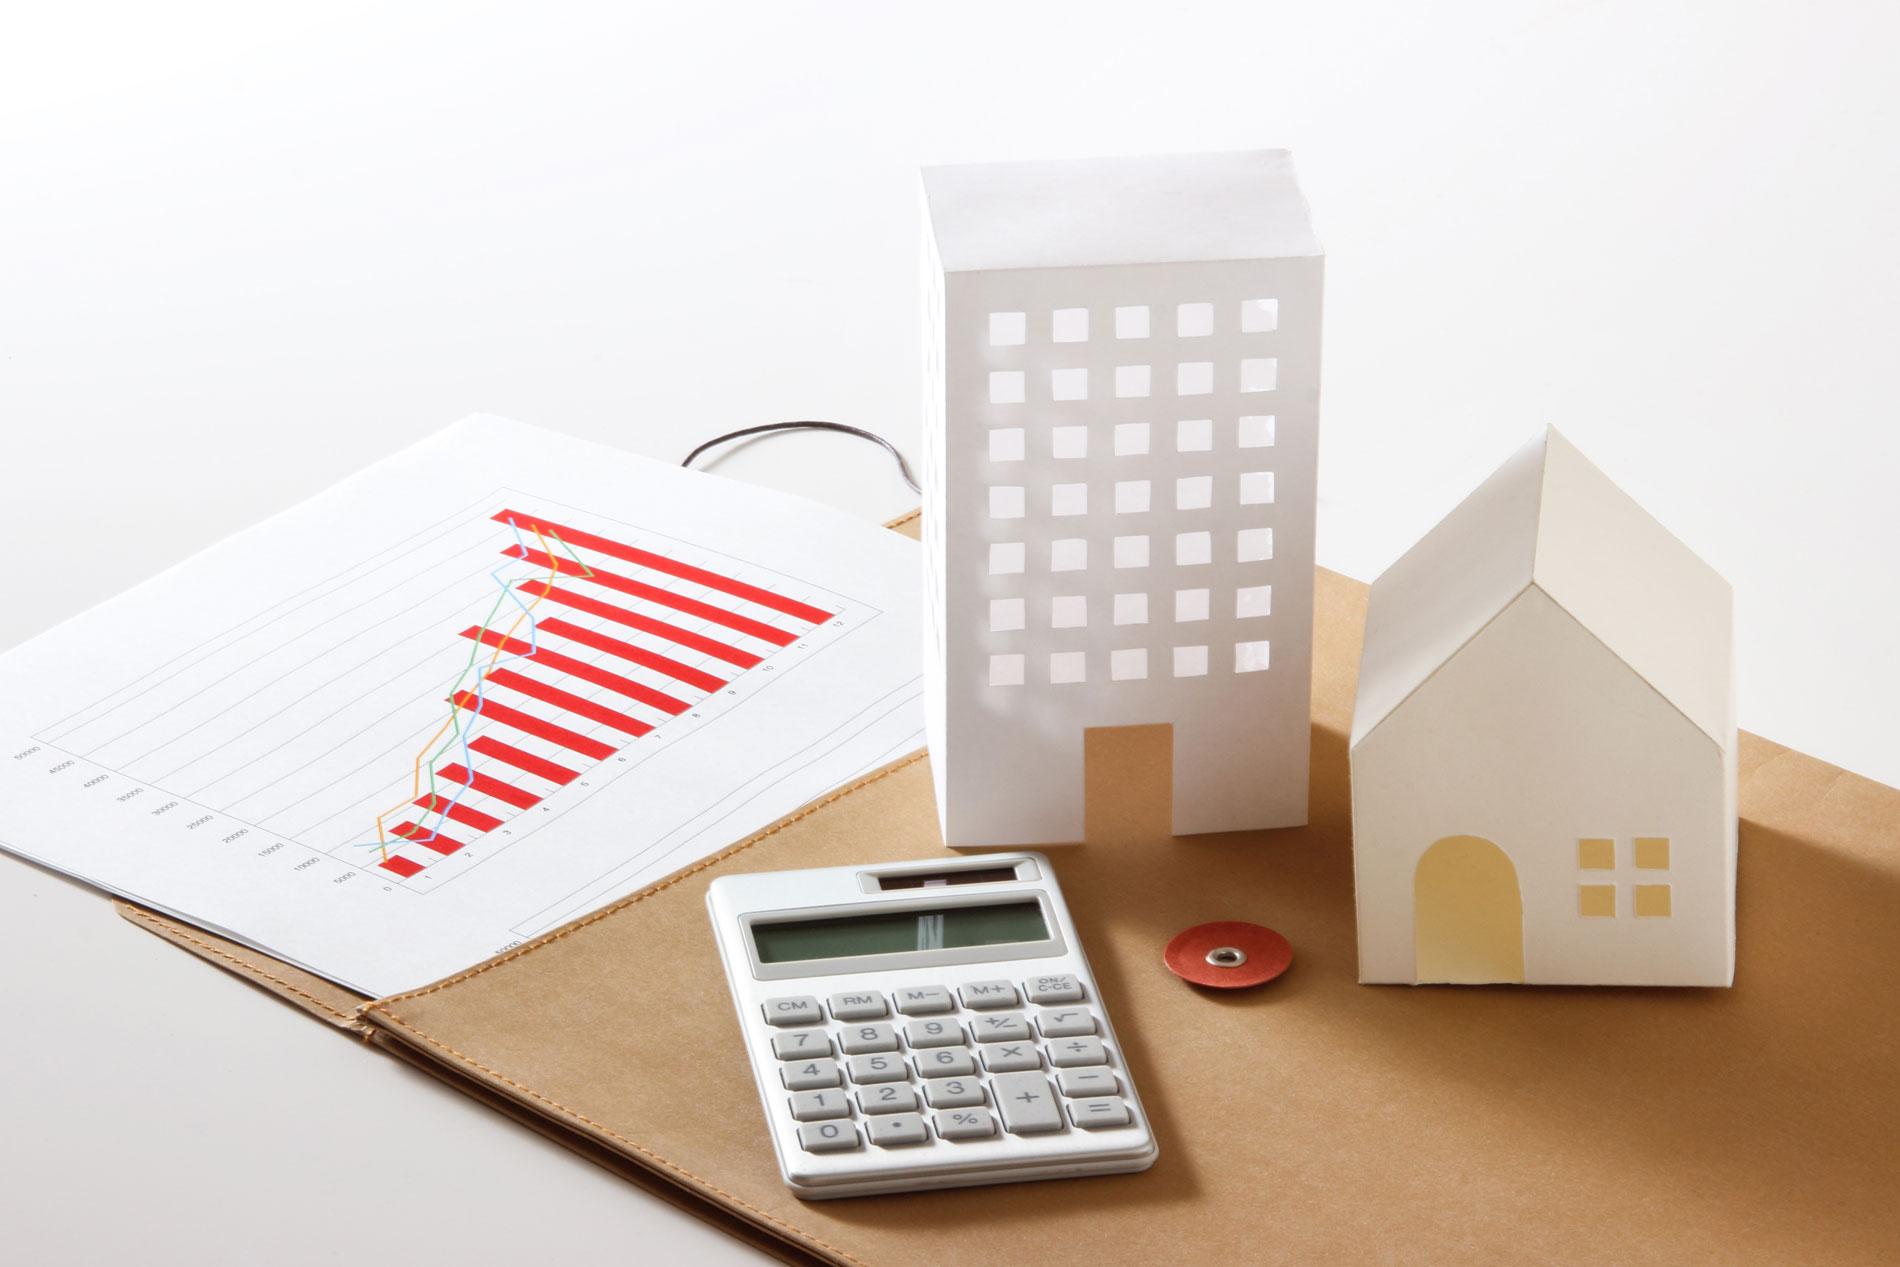 Calculator and condo building